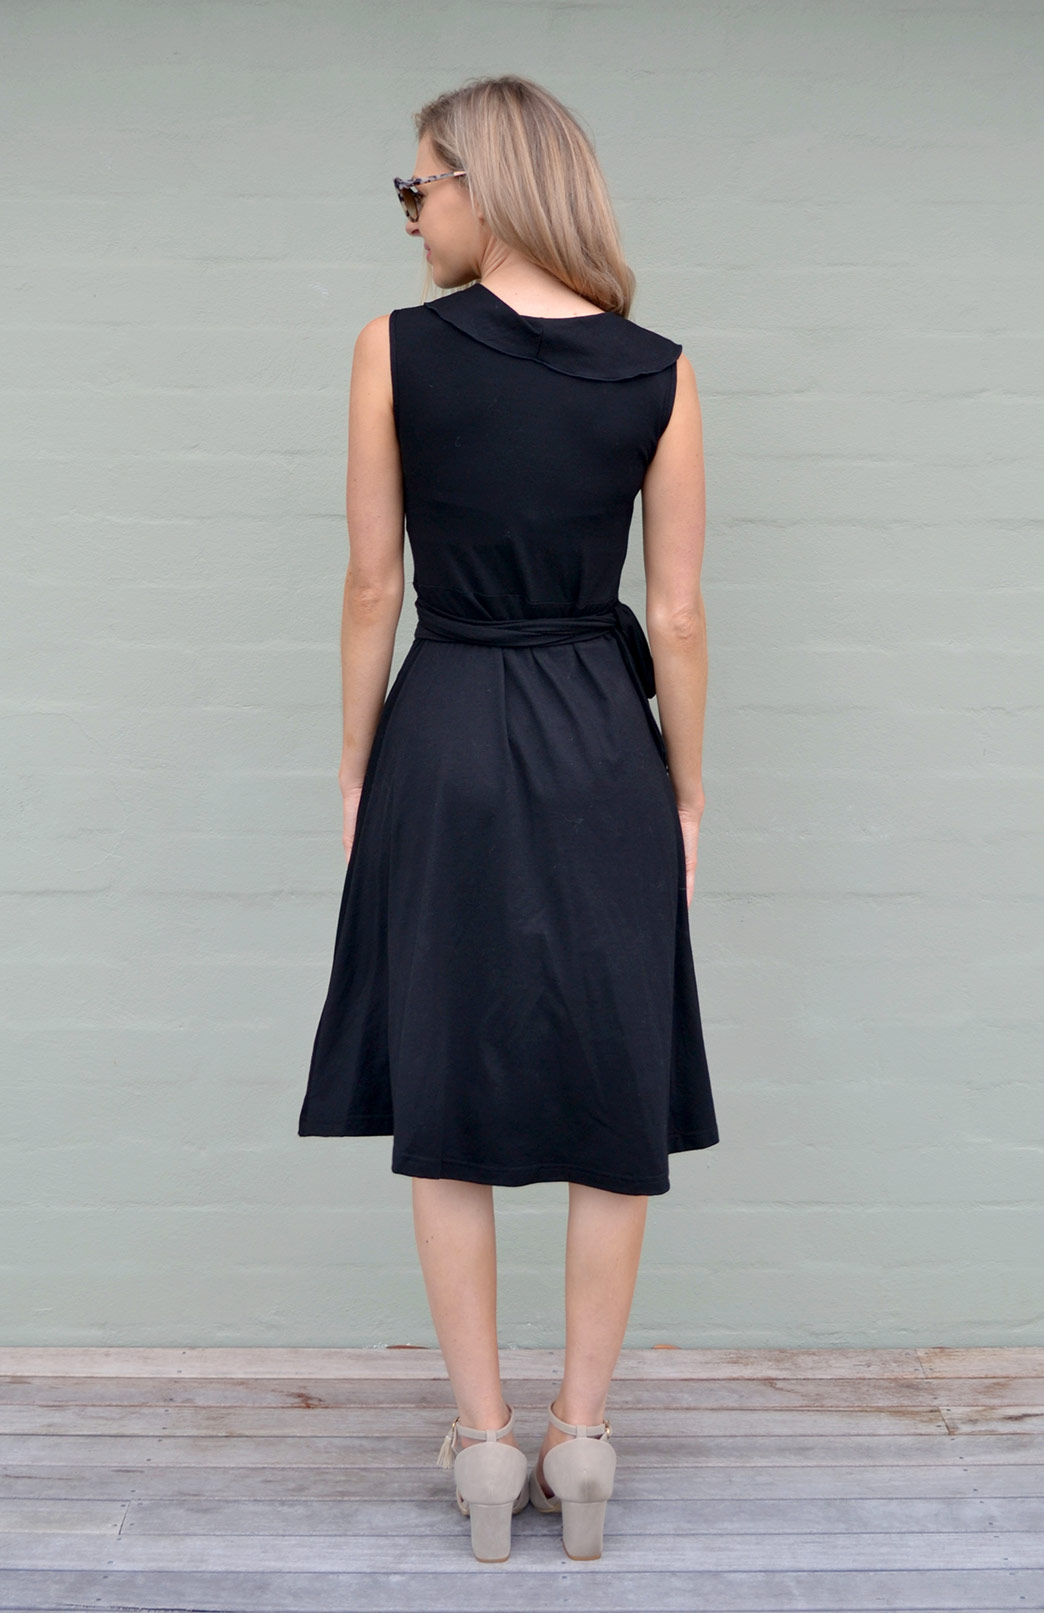 05685273f544 Ophelia Wrap Dress. Women's Summer Sleeveless Black Merino Wool Wrap Dress  with Ruffled Collar